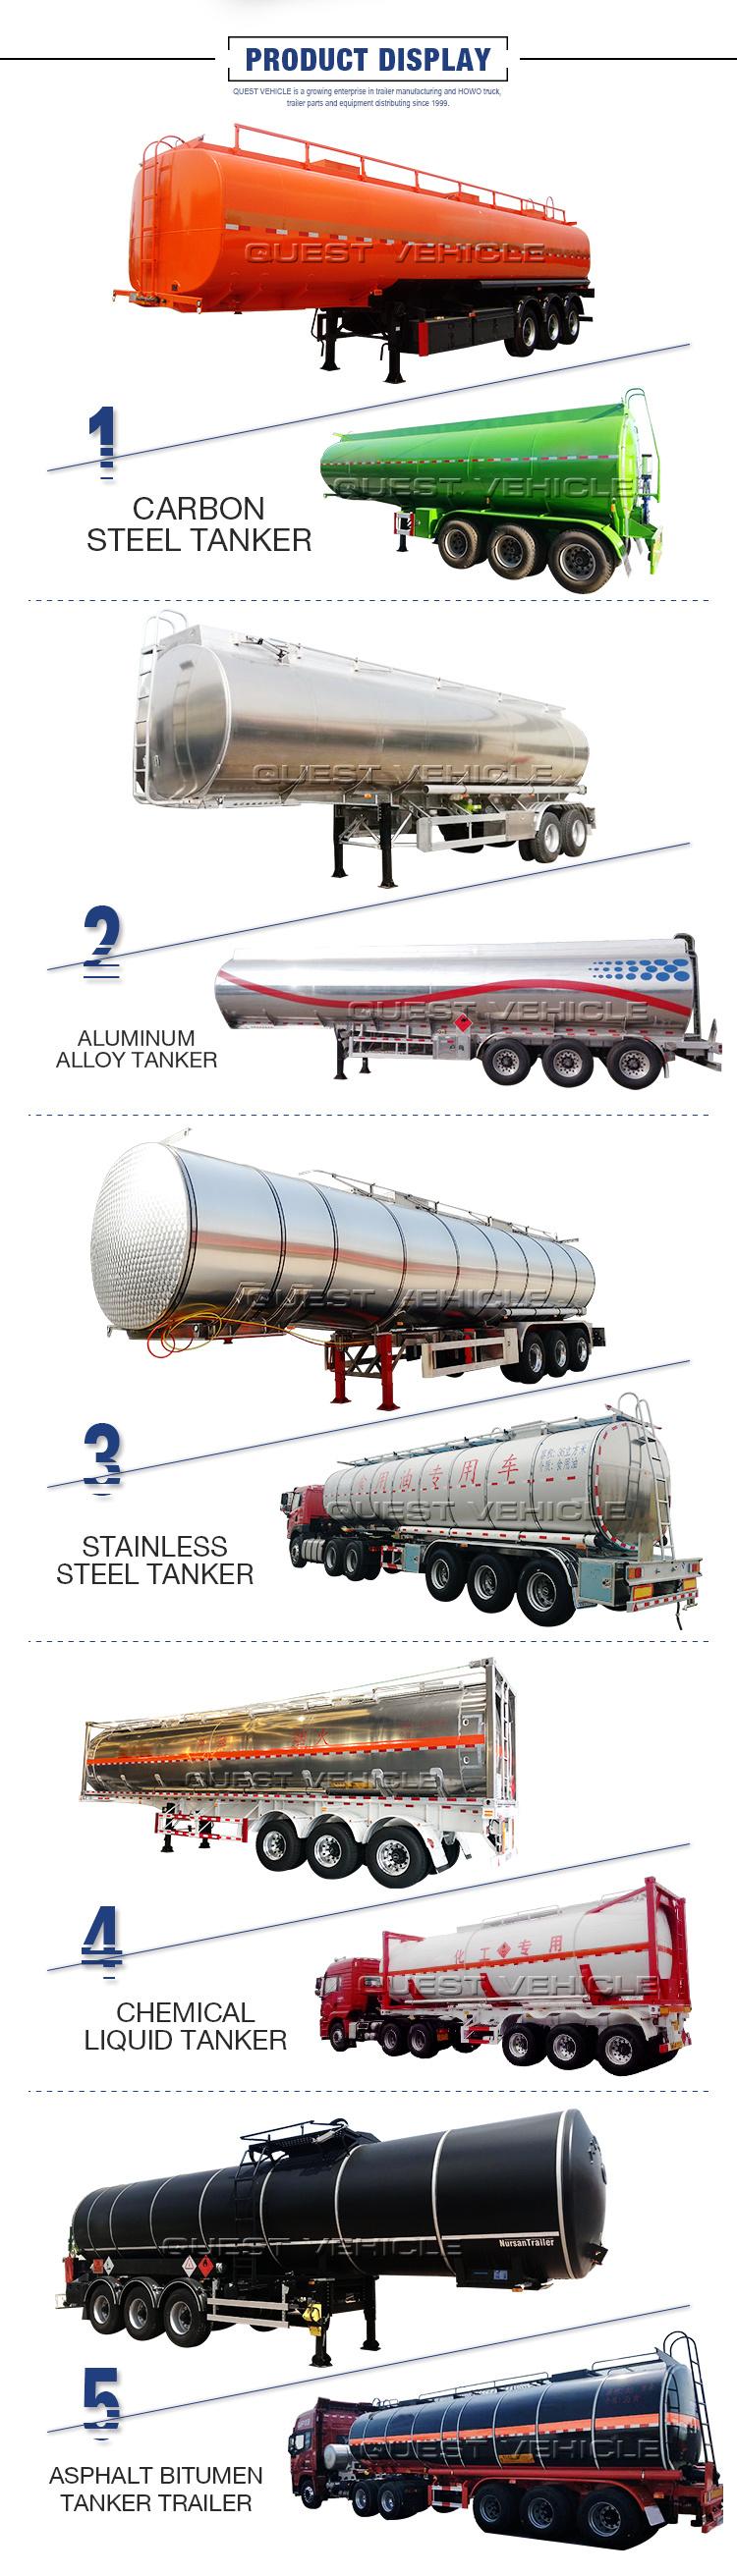 Stainless Steel Tank Truck Capacity Fuel Oil Tanker Semi Trailer